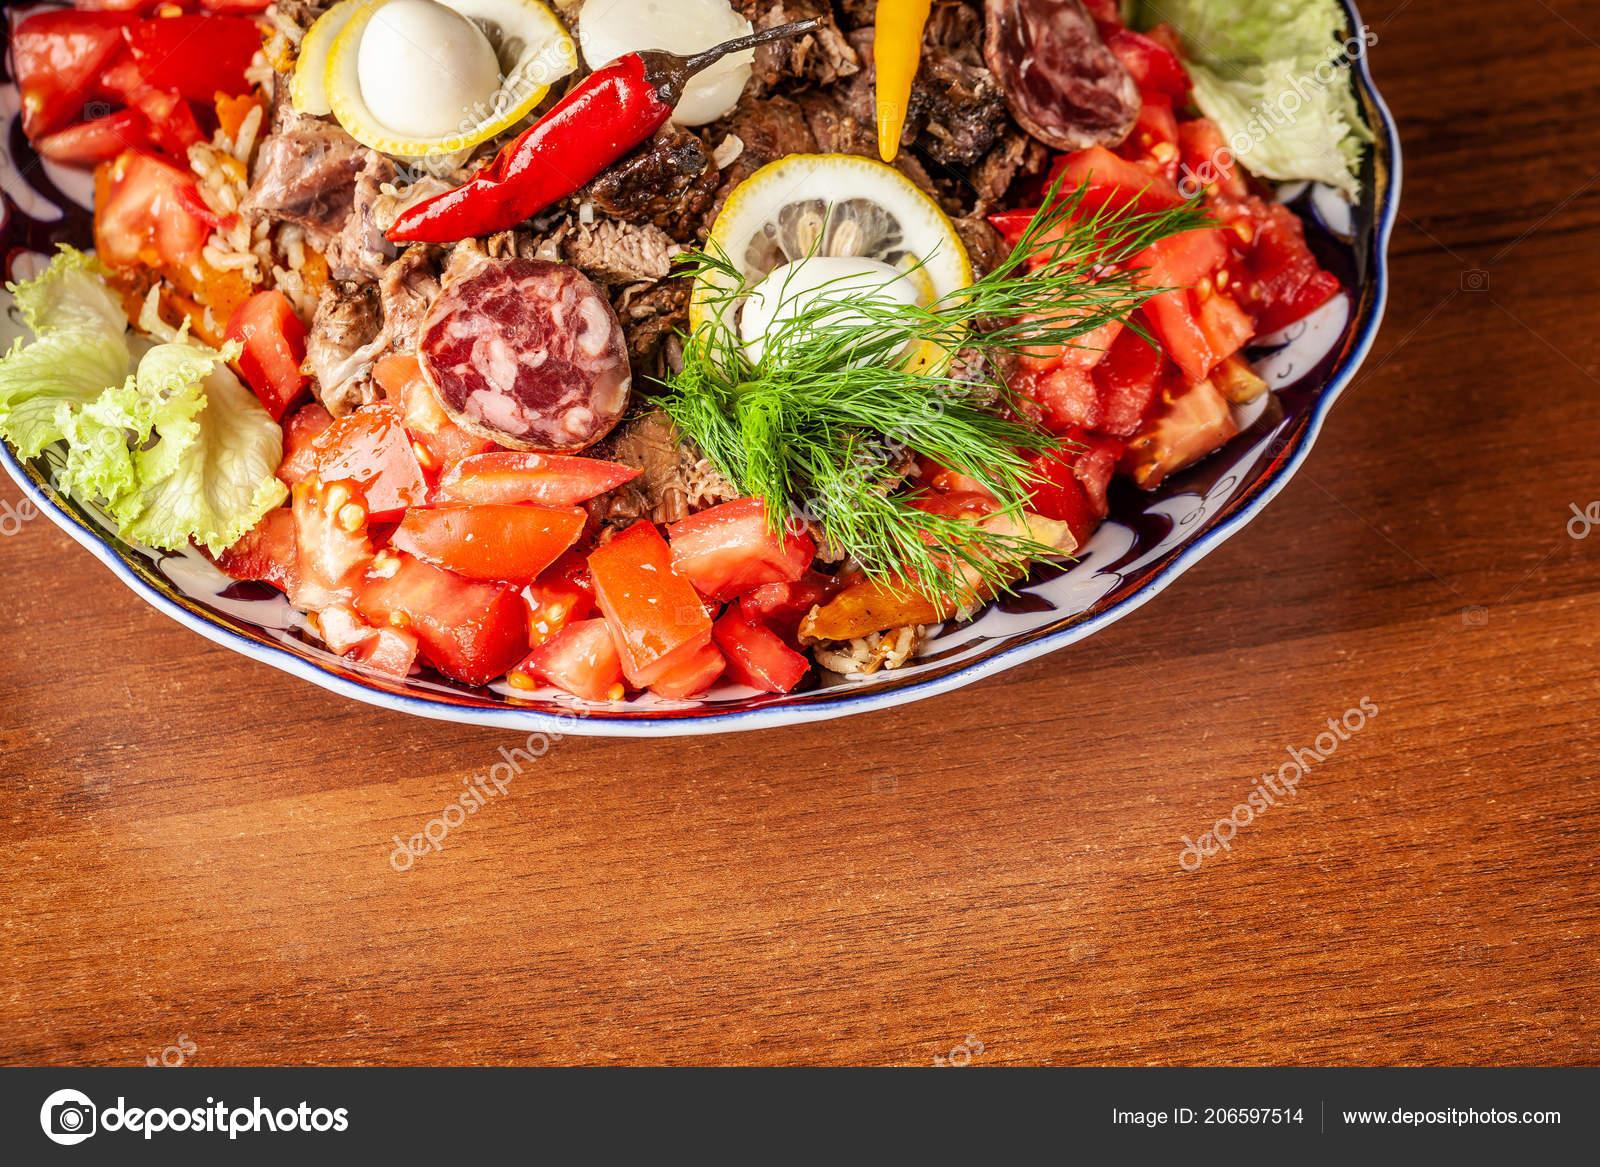 Traditional Uzbek Oriental Cuisine Samarkand Pilaf Mutton Vegetables on